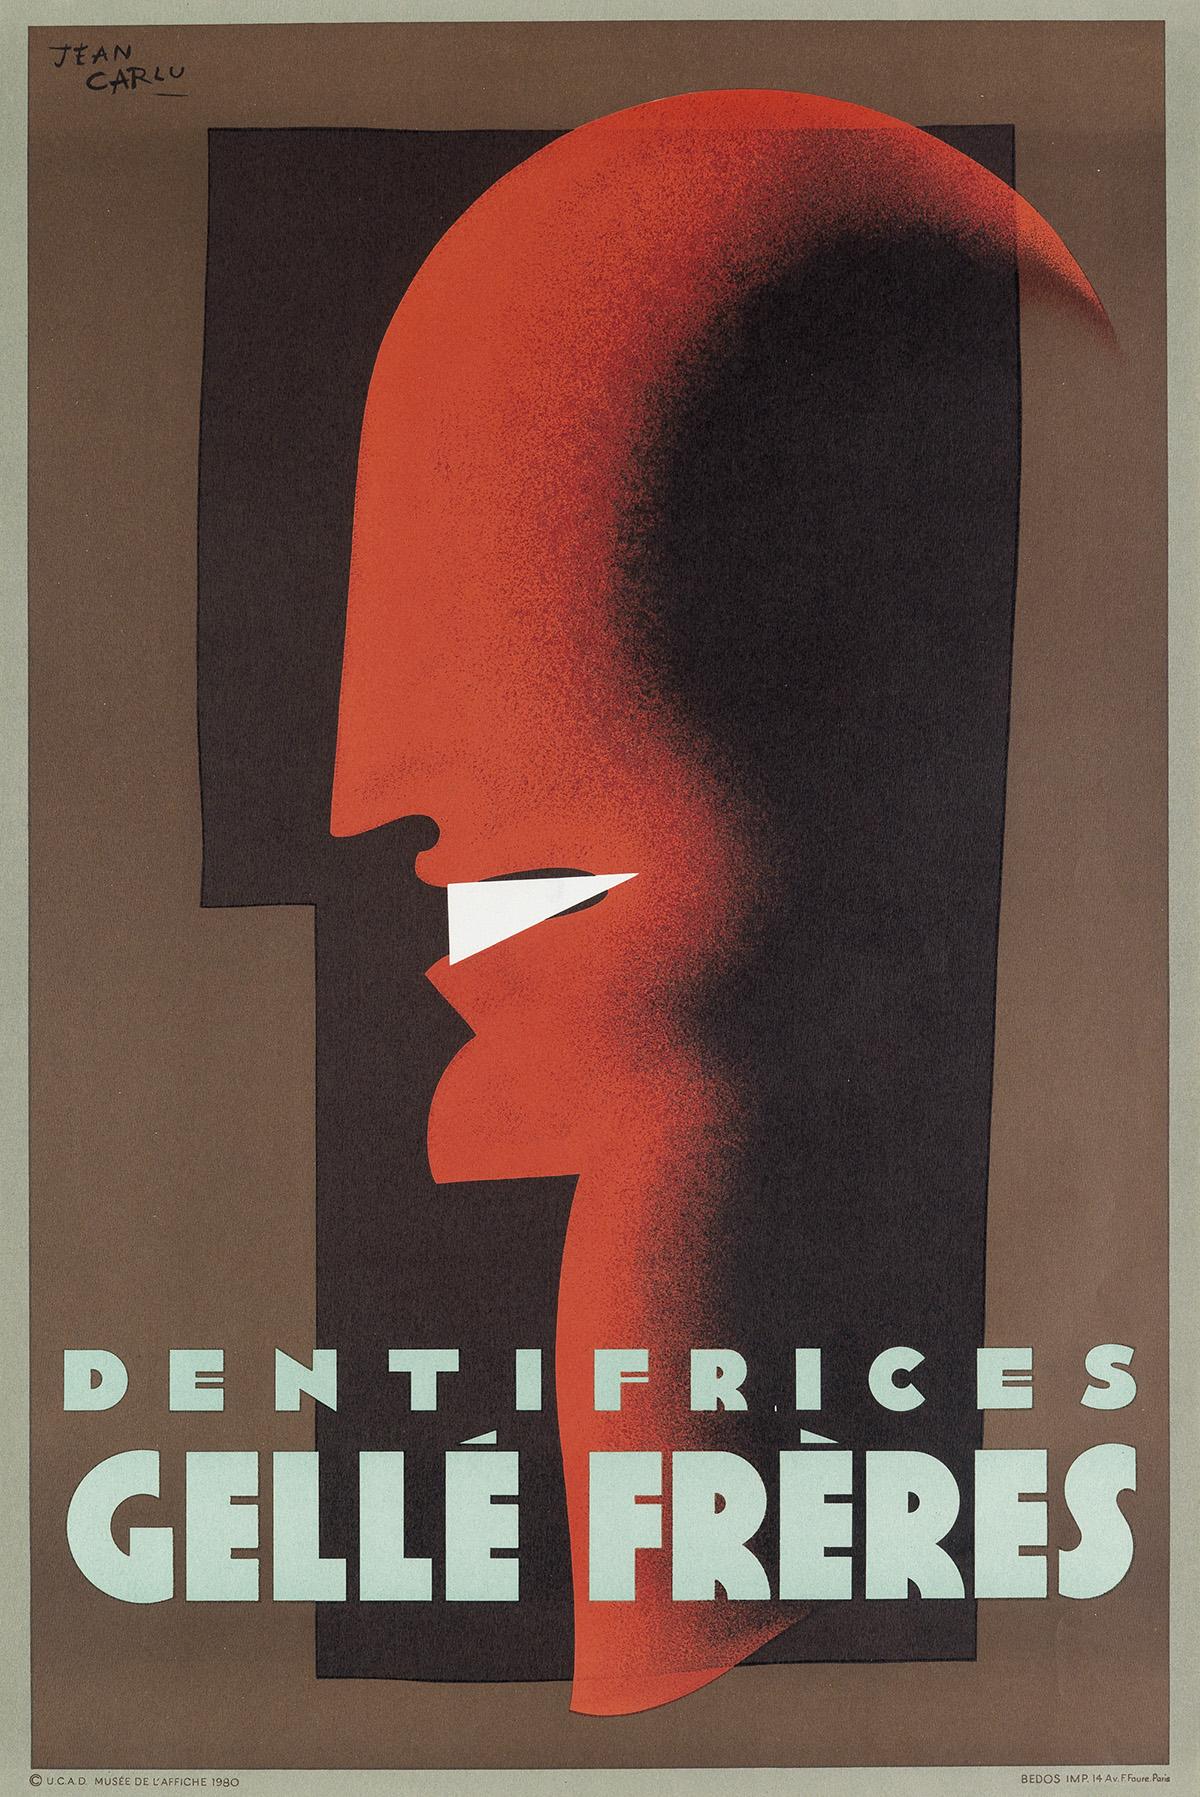 JEAN-CARLU-(1900-1997)-DENTIFRICES--GELLÉ-FRÈRES-1980-31x21-